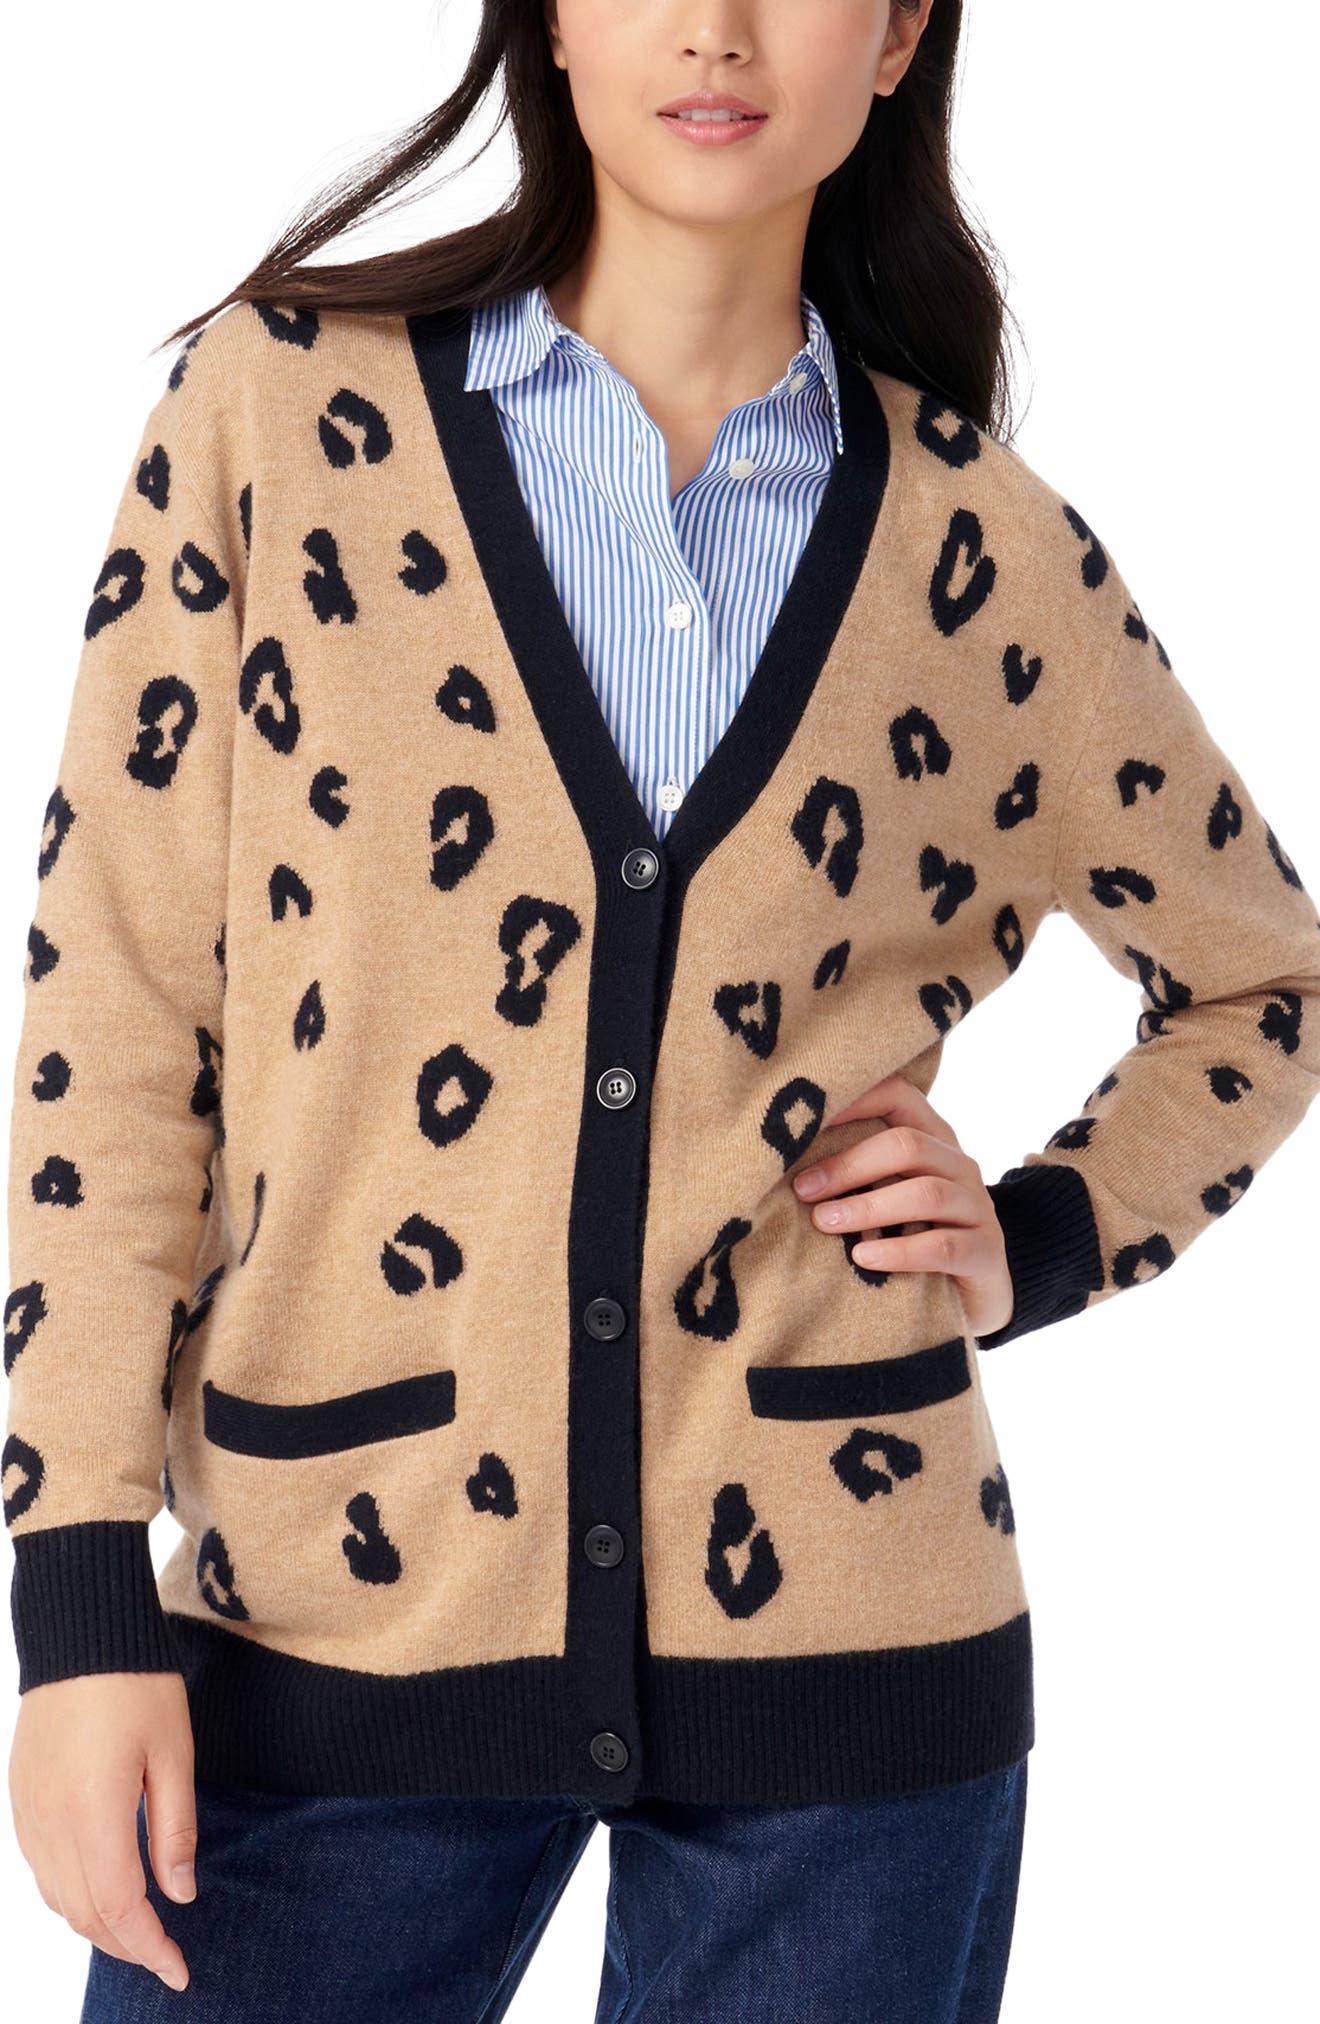 J.Crew Leopard Print Cashmere Boyfriend Cardigan | Nordstrom